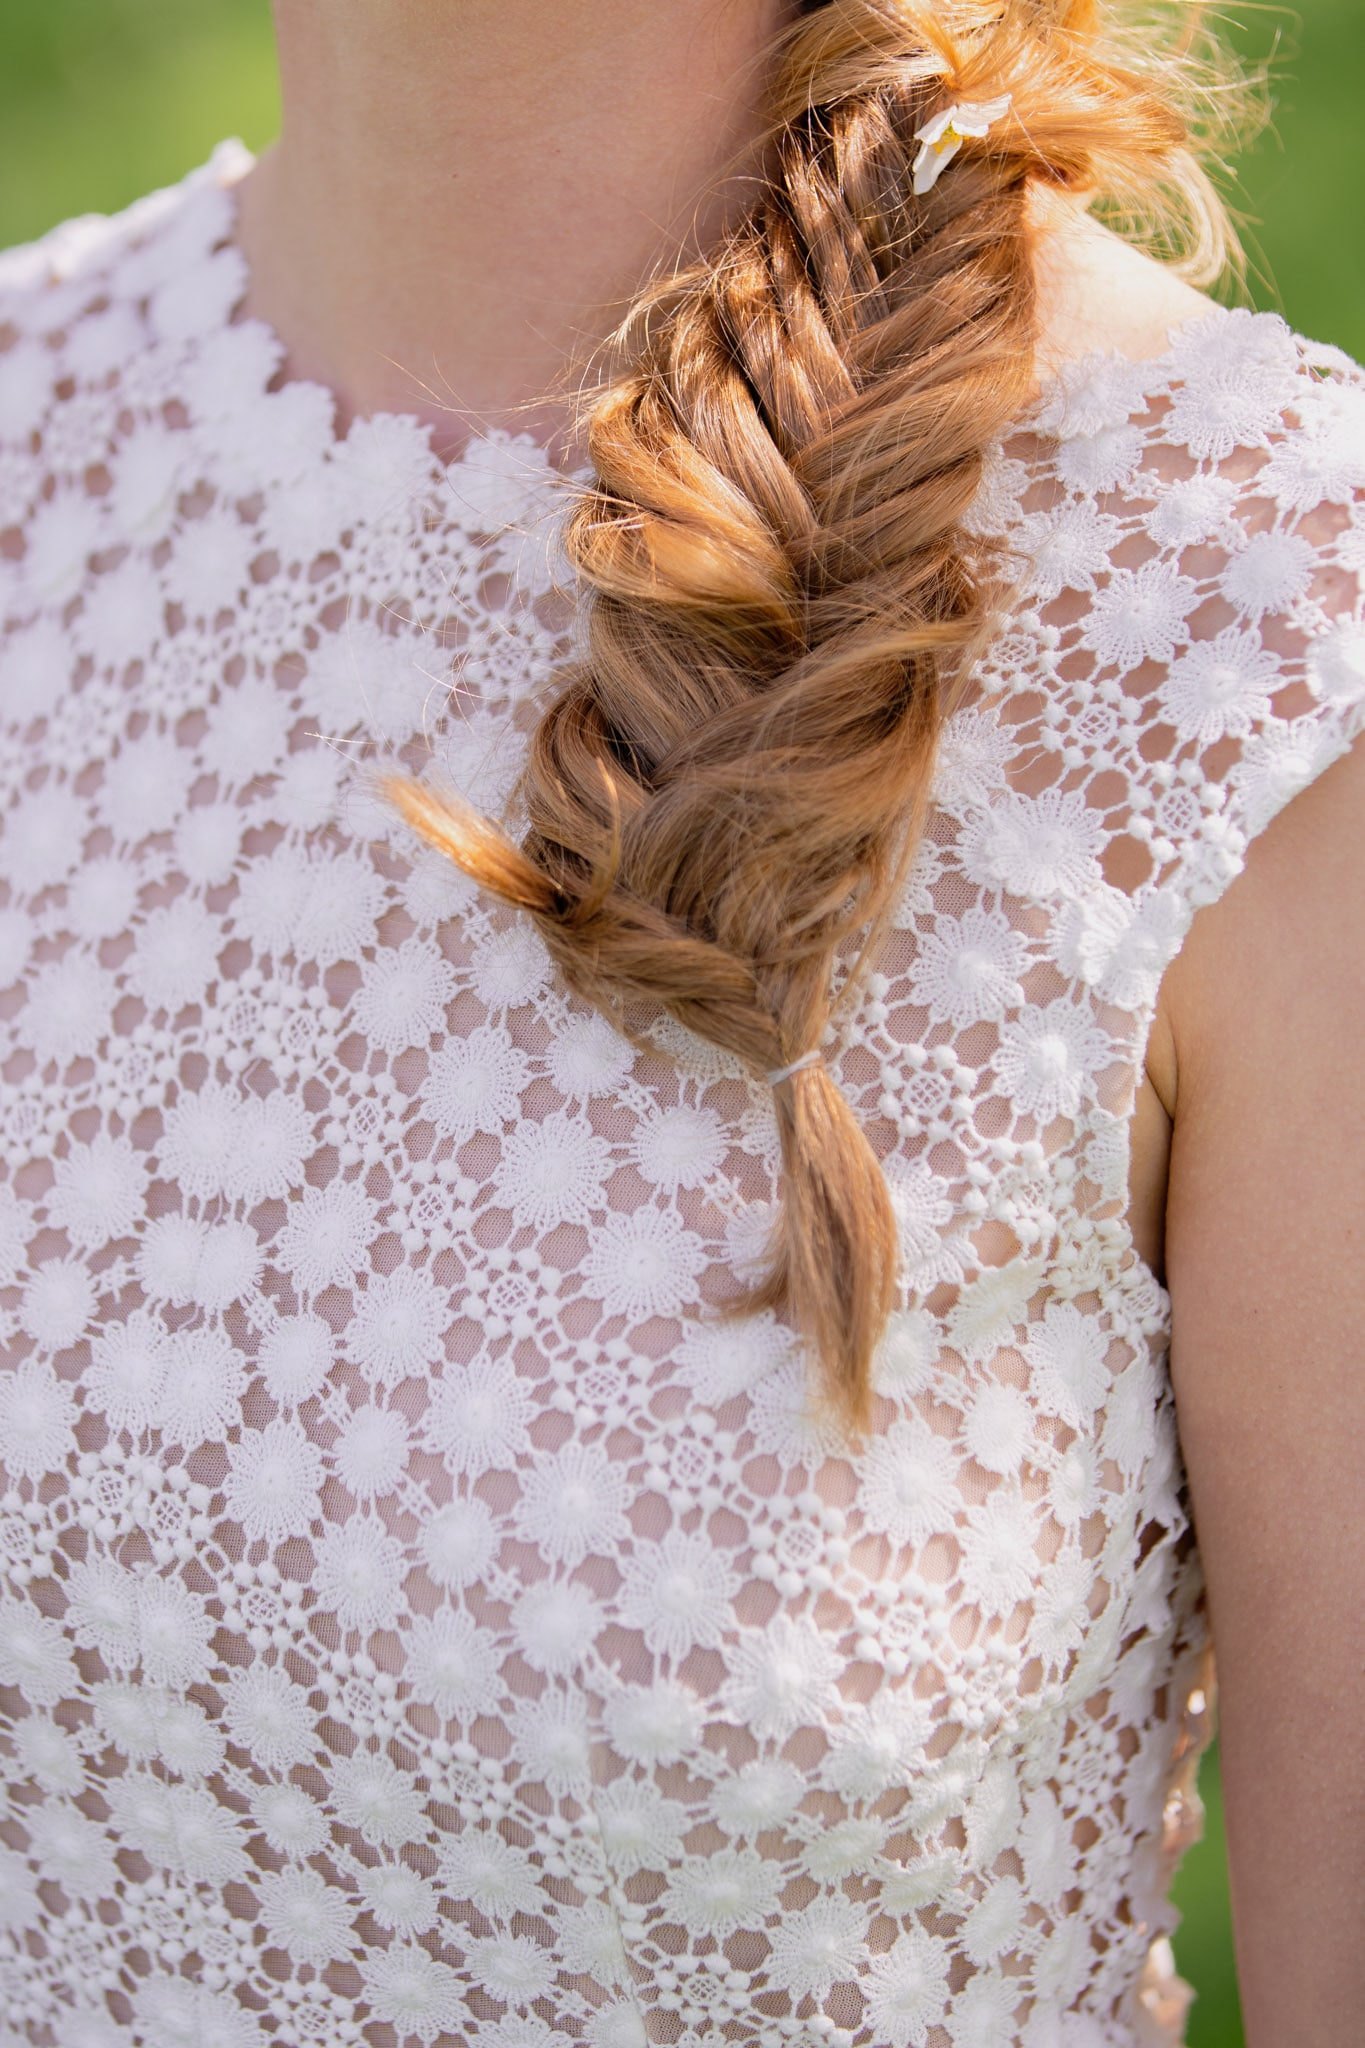 Claudia Heller Modedesign kurzes Brautkleid Daisy 7 min – gesehen bei frauimmer-herrewig.de